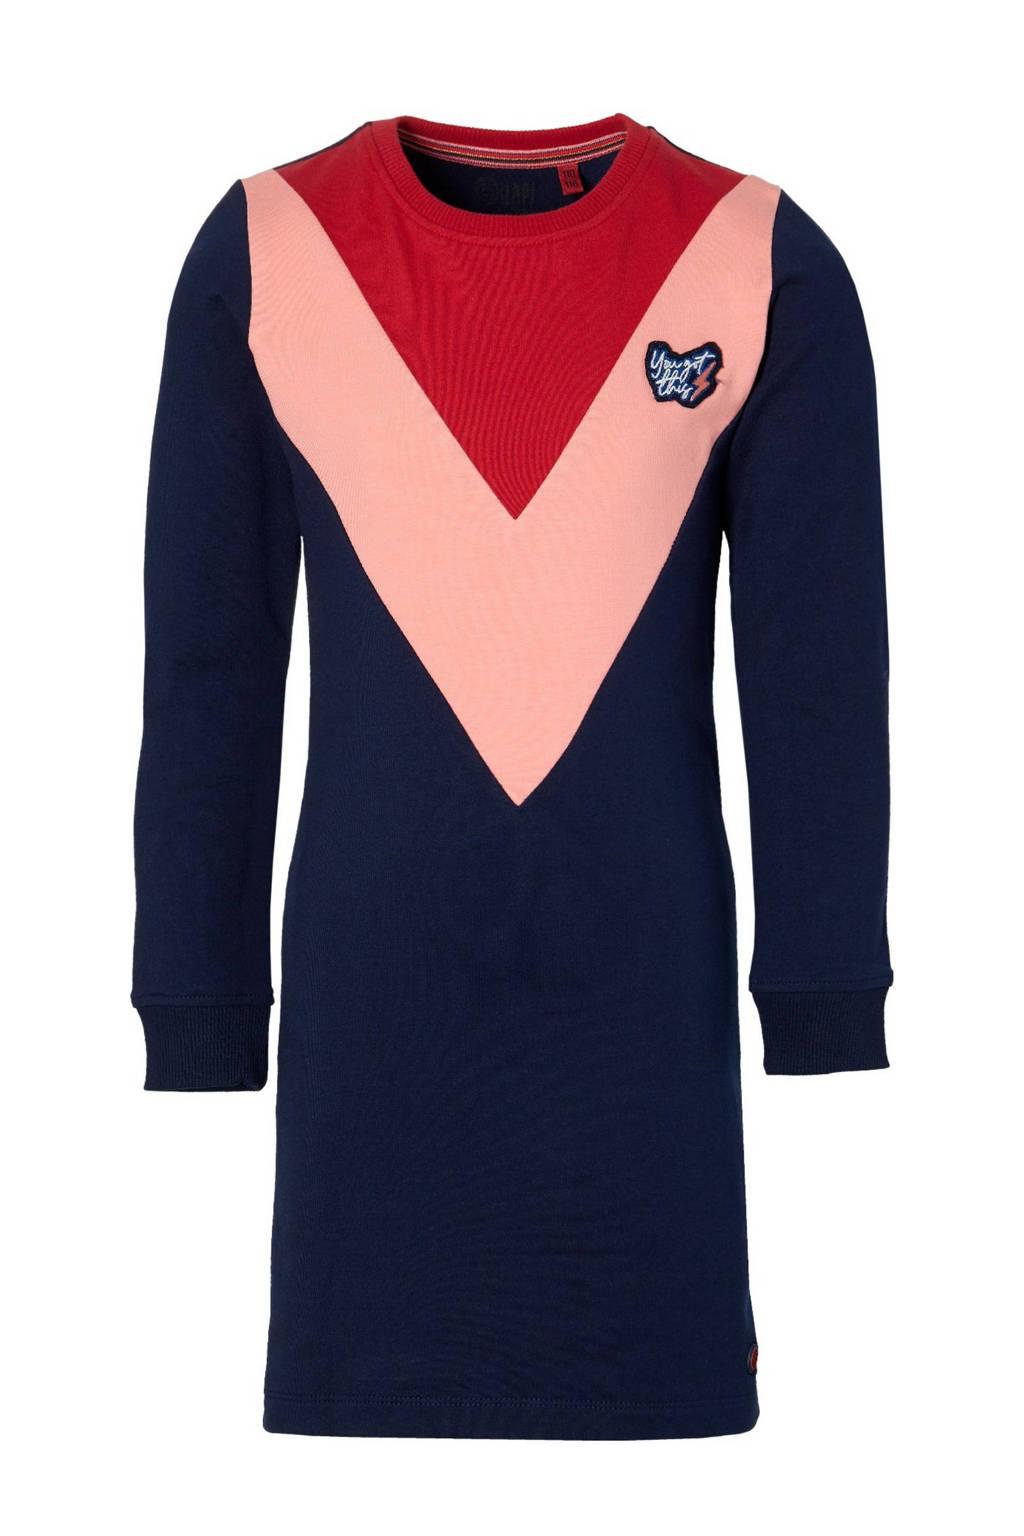 Quapi Girls sweatjurk Danila donkerblauw/roze/rood, Donkerblauw/roze/rood